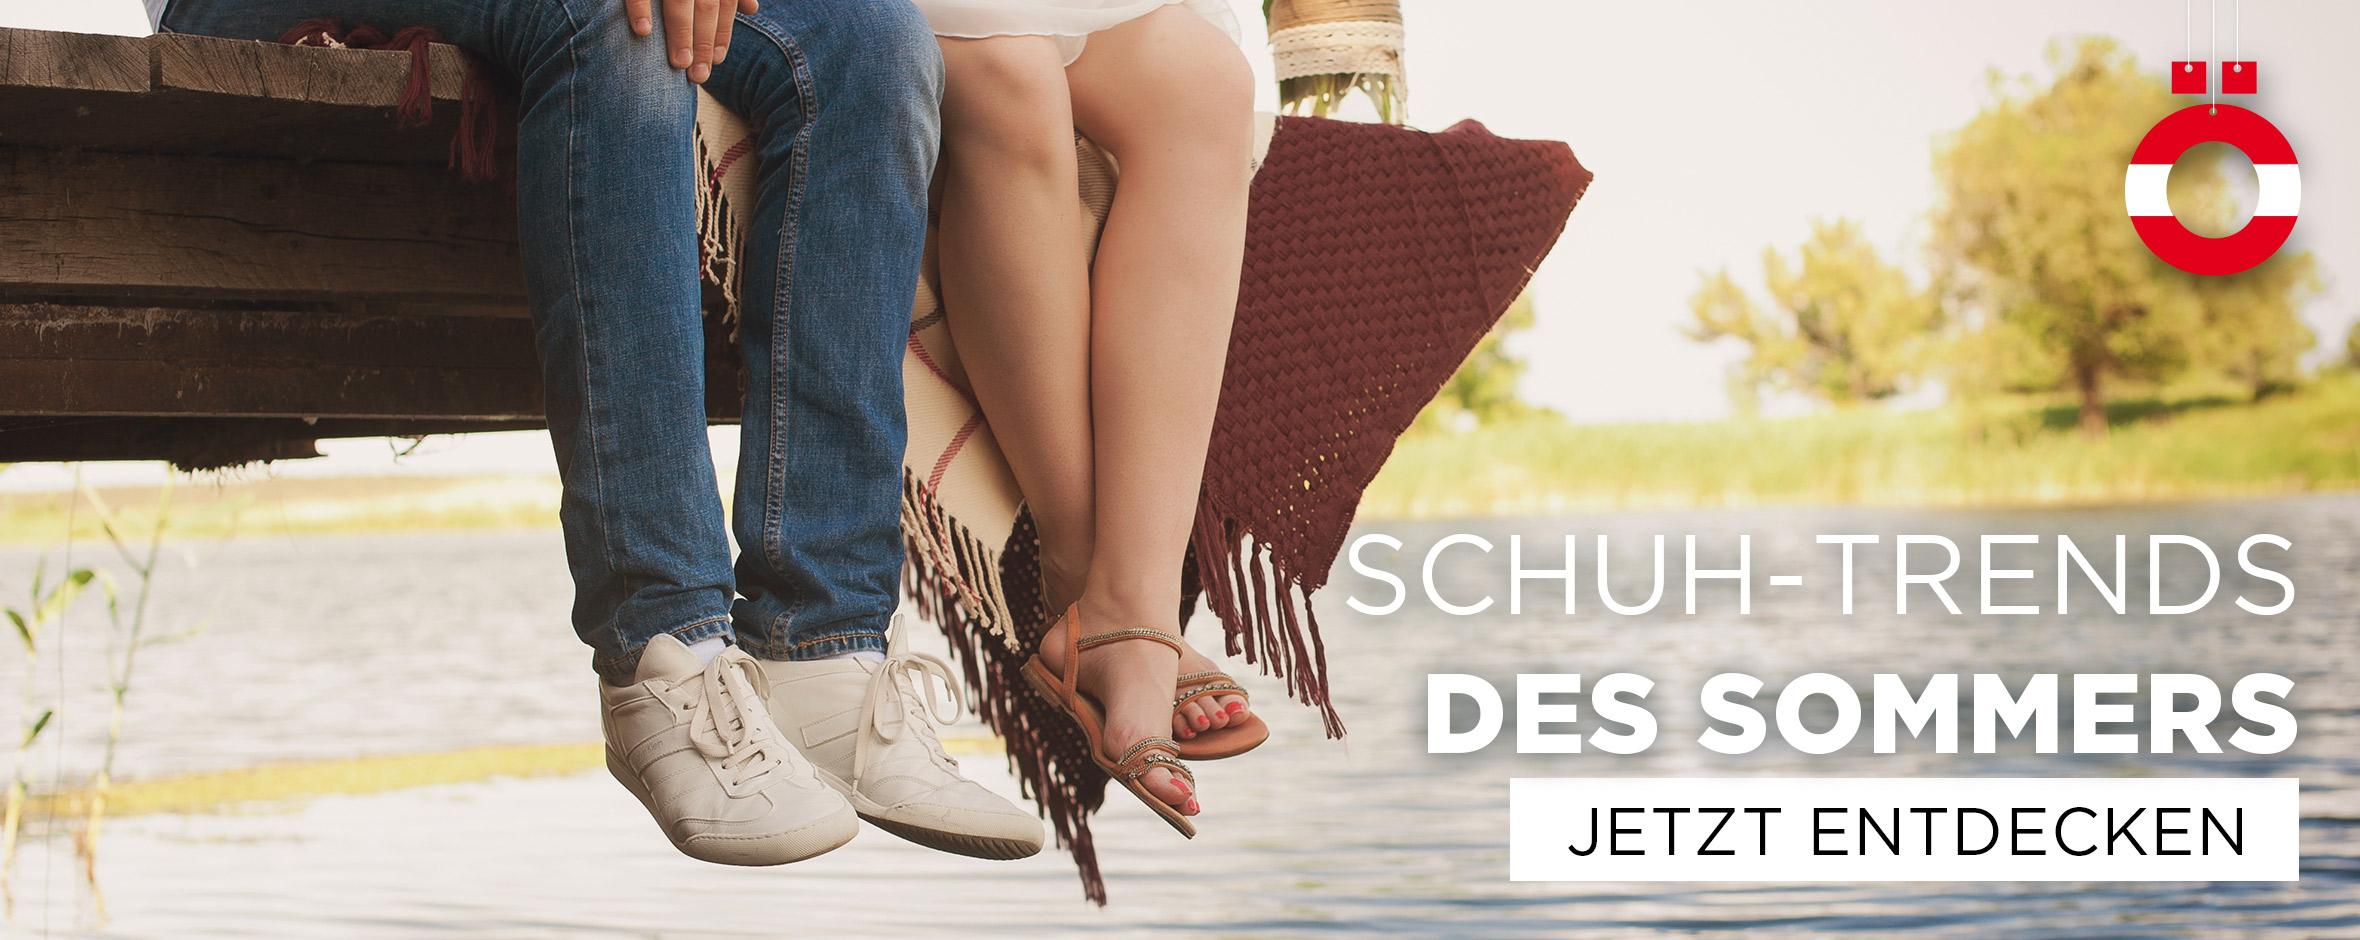 Schuh-Trends des Sommers